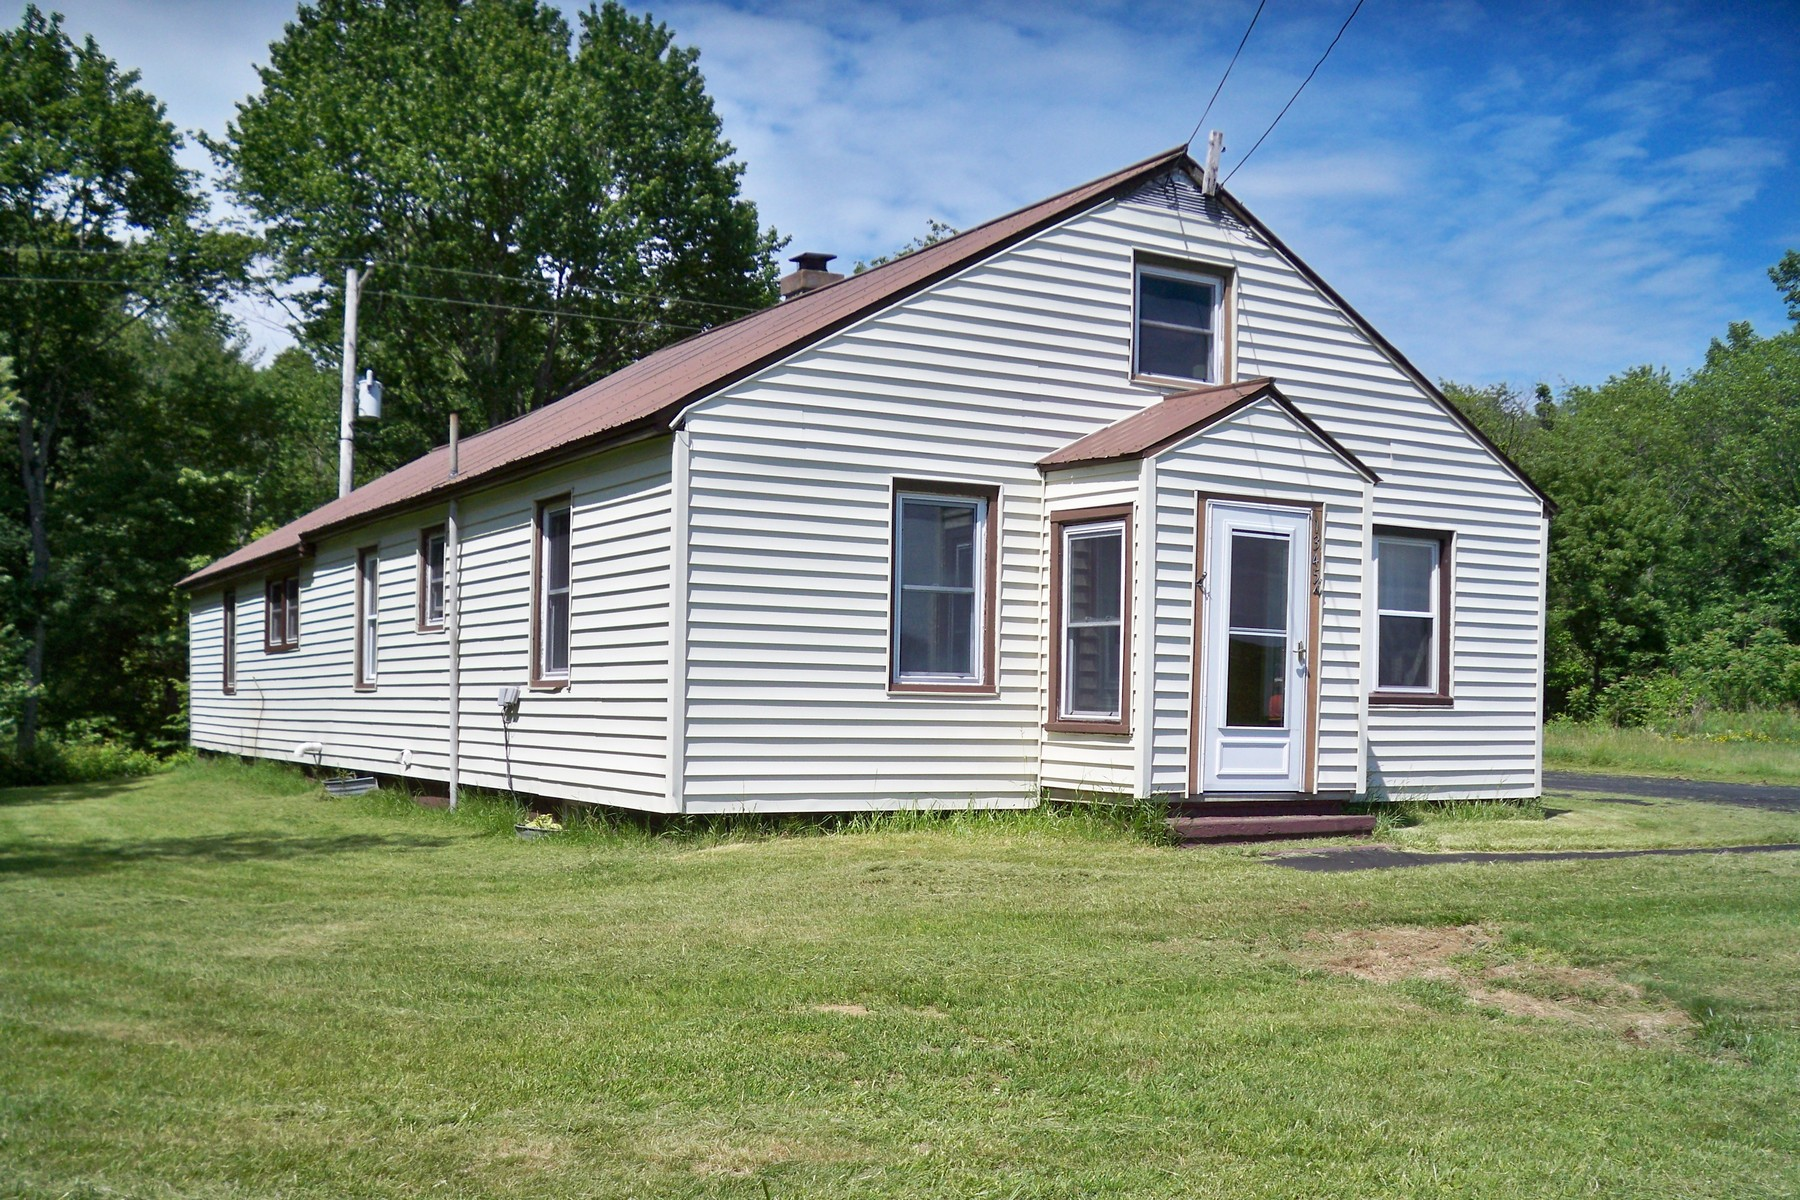 Nhà ở một gia đình vì Bán tại Affordable 1 Level Ranch in the Peaceful Countryside 1345 Route 32N Schuylerville, New York 12871 Hoa Kỳ